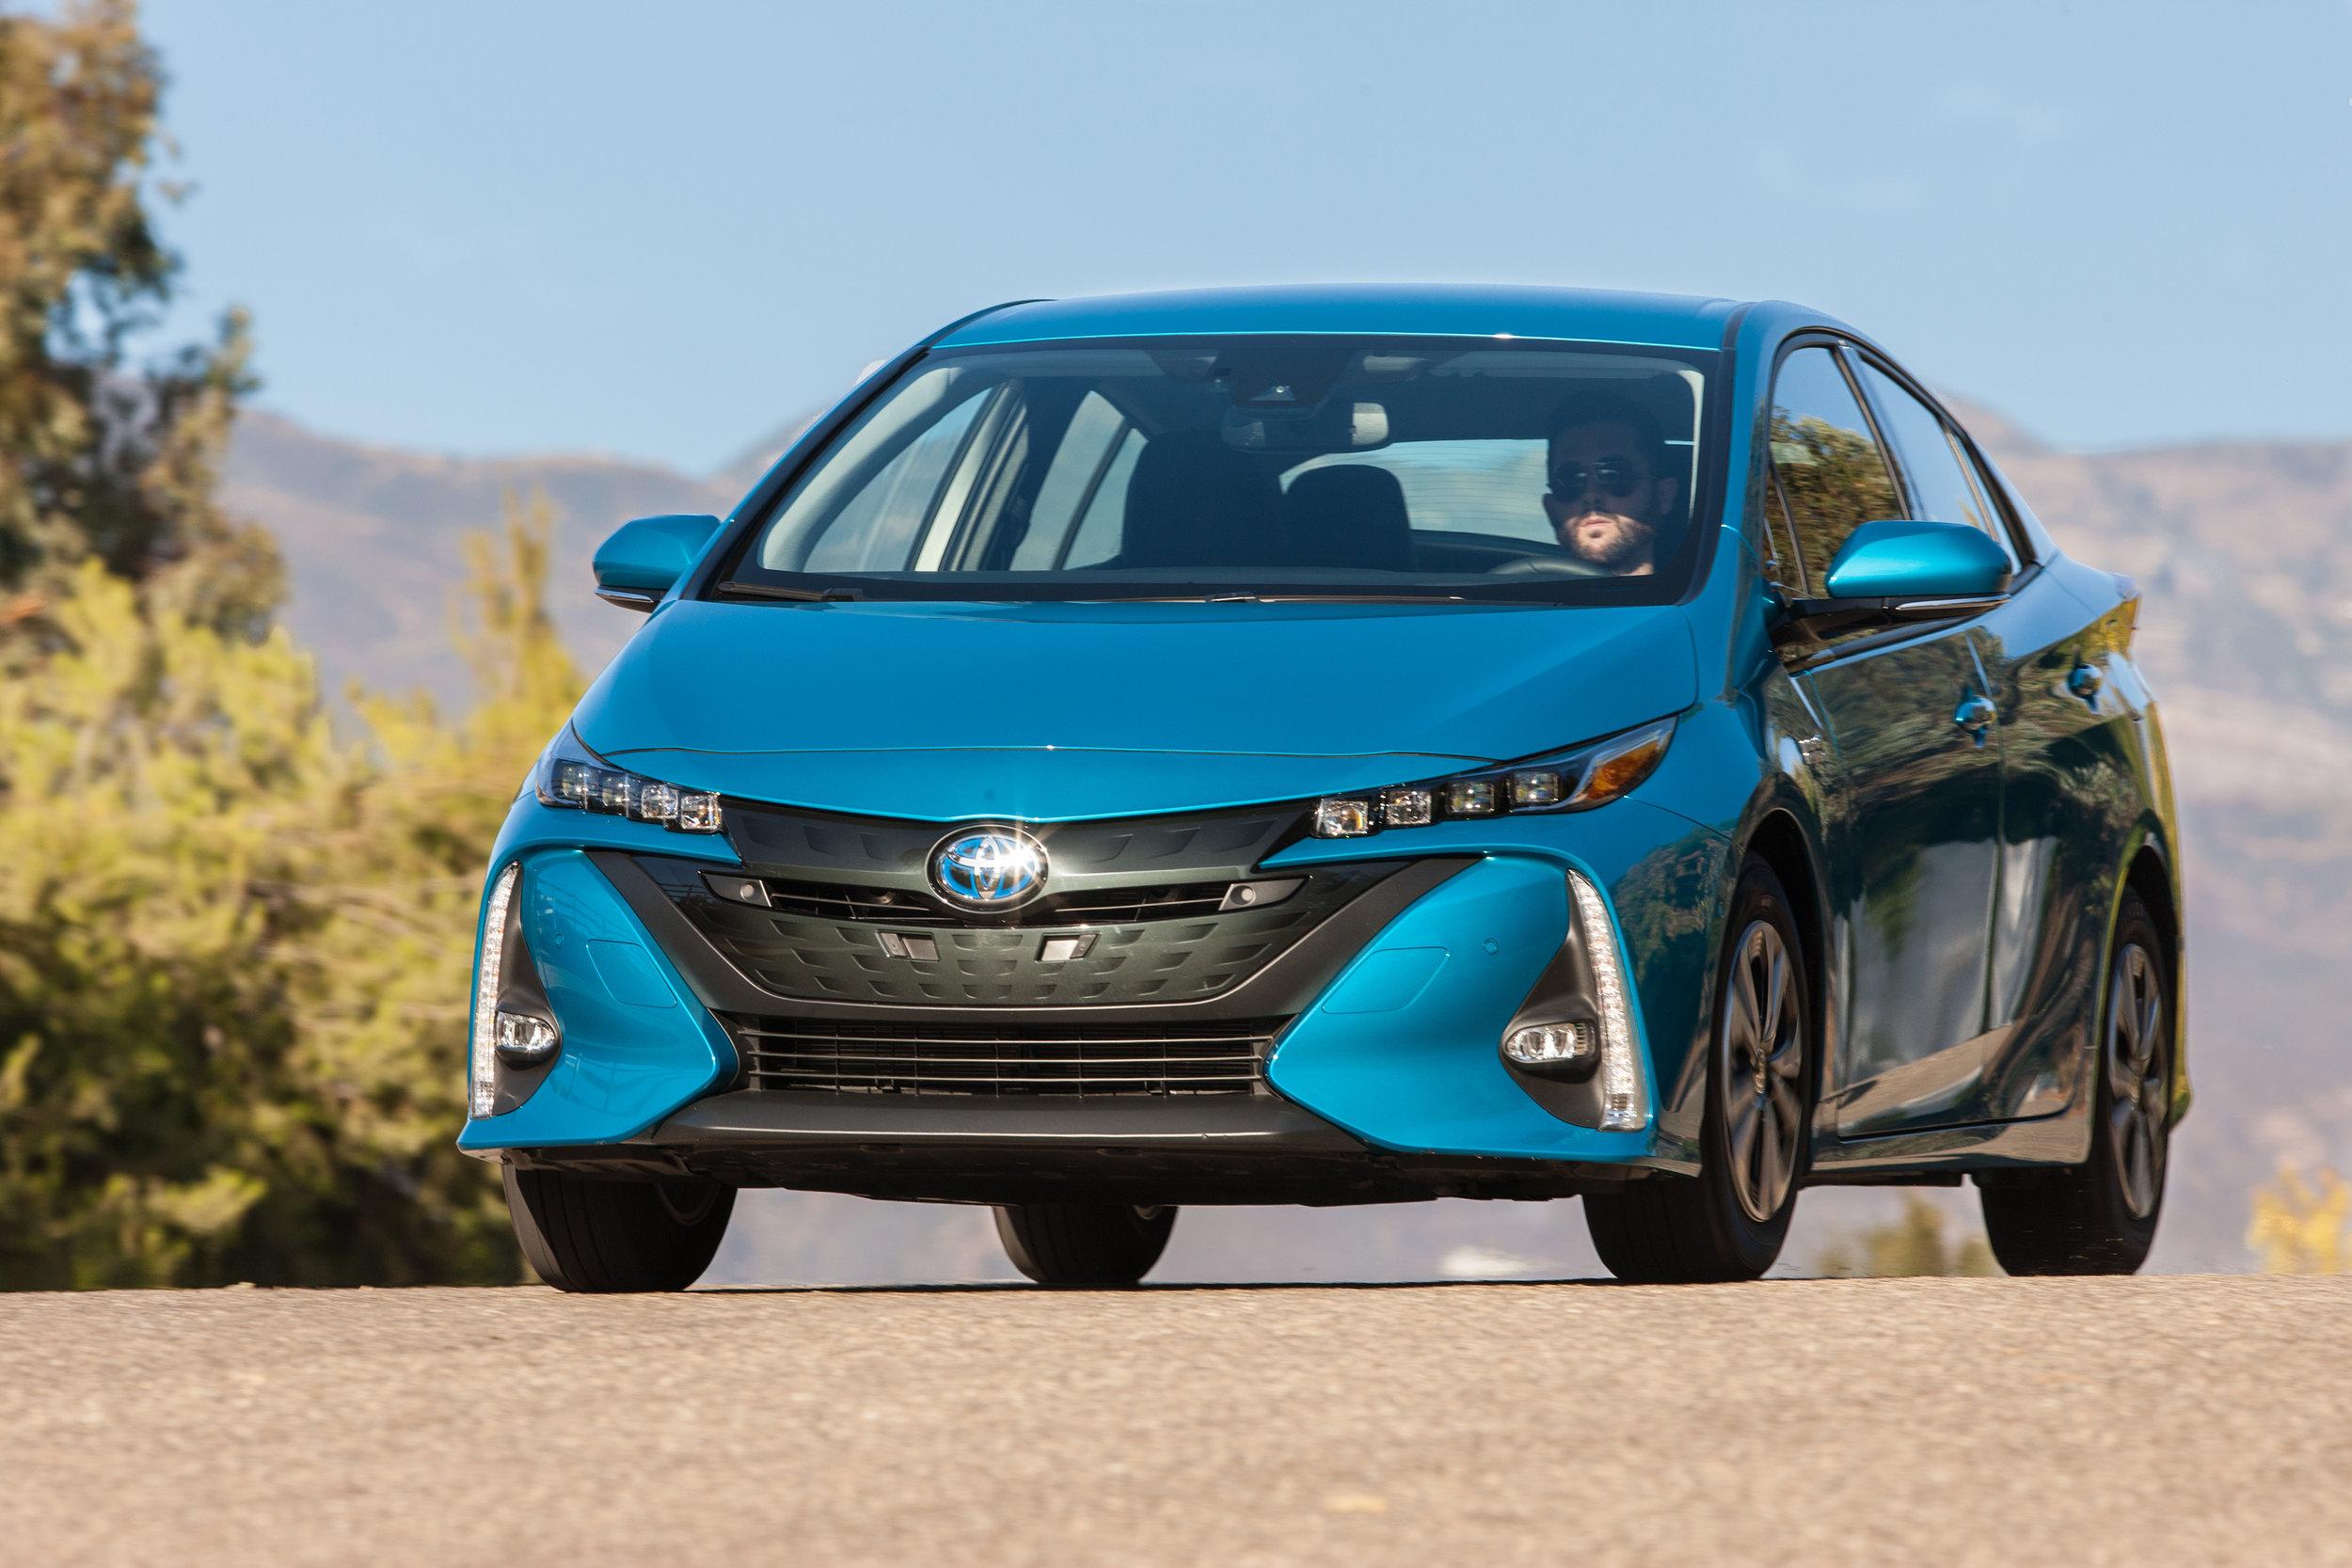 2017_Toyota_Prius_Prime_Advanced_007_C1199284E676BE169488CE1F66B50CDFF947957C.jpg